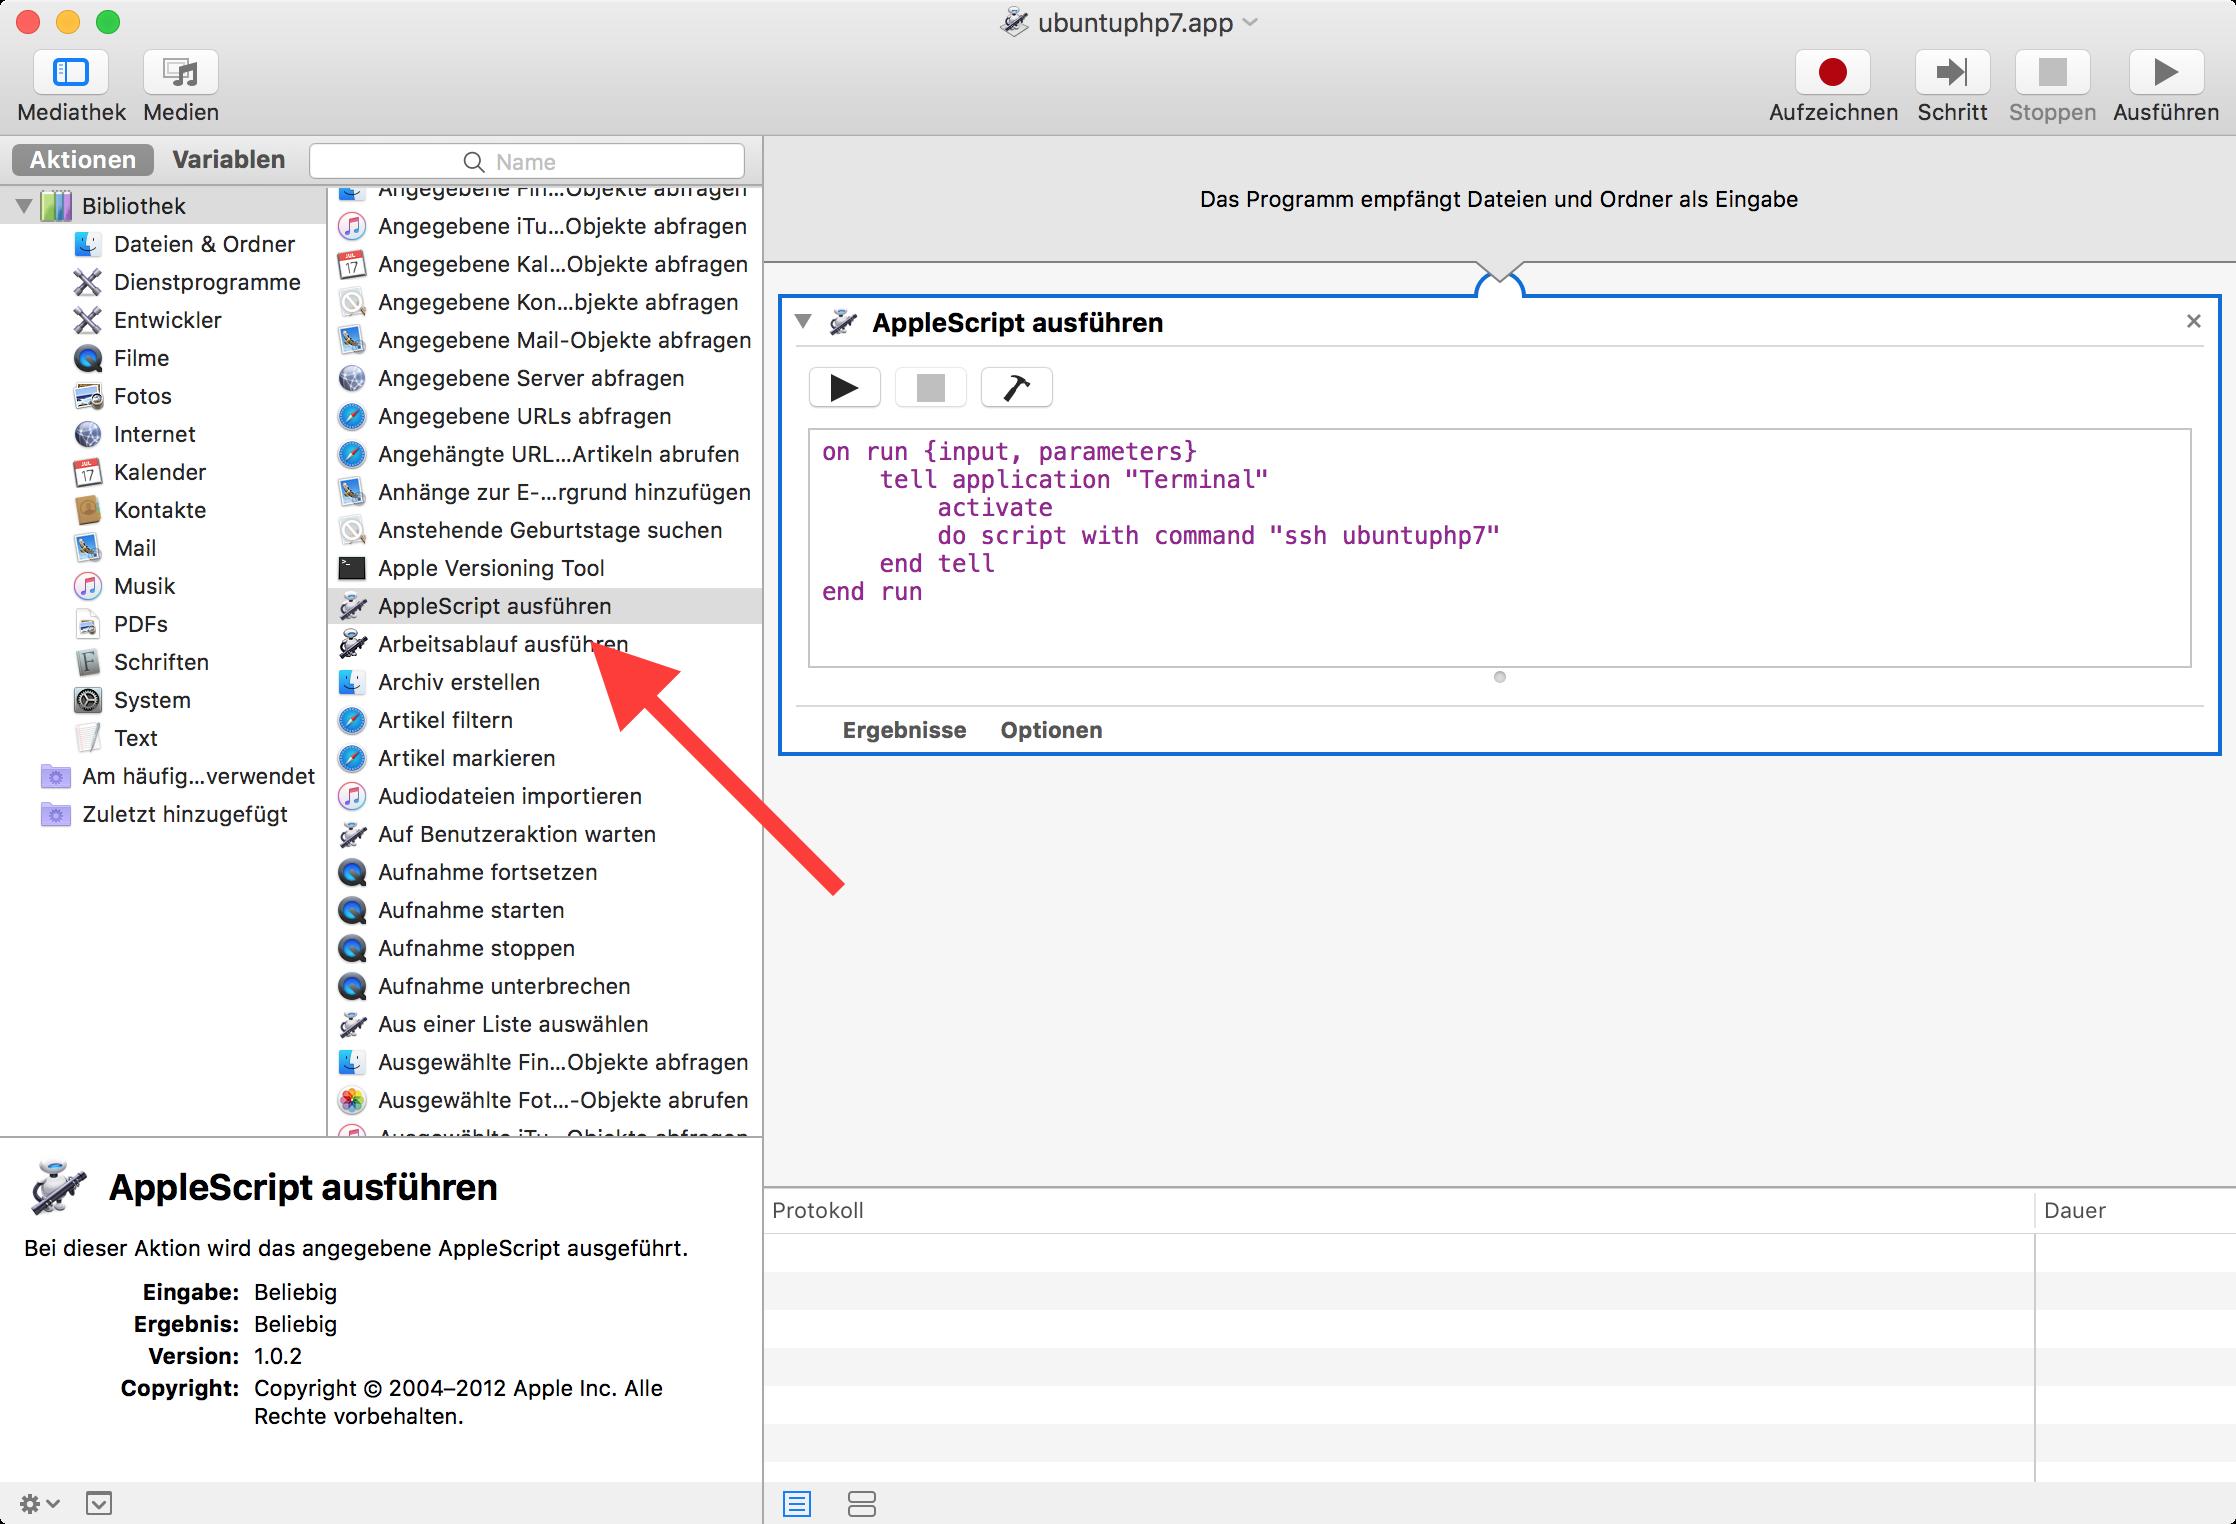 AppleScript mit dem Automator erzeugen